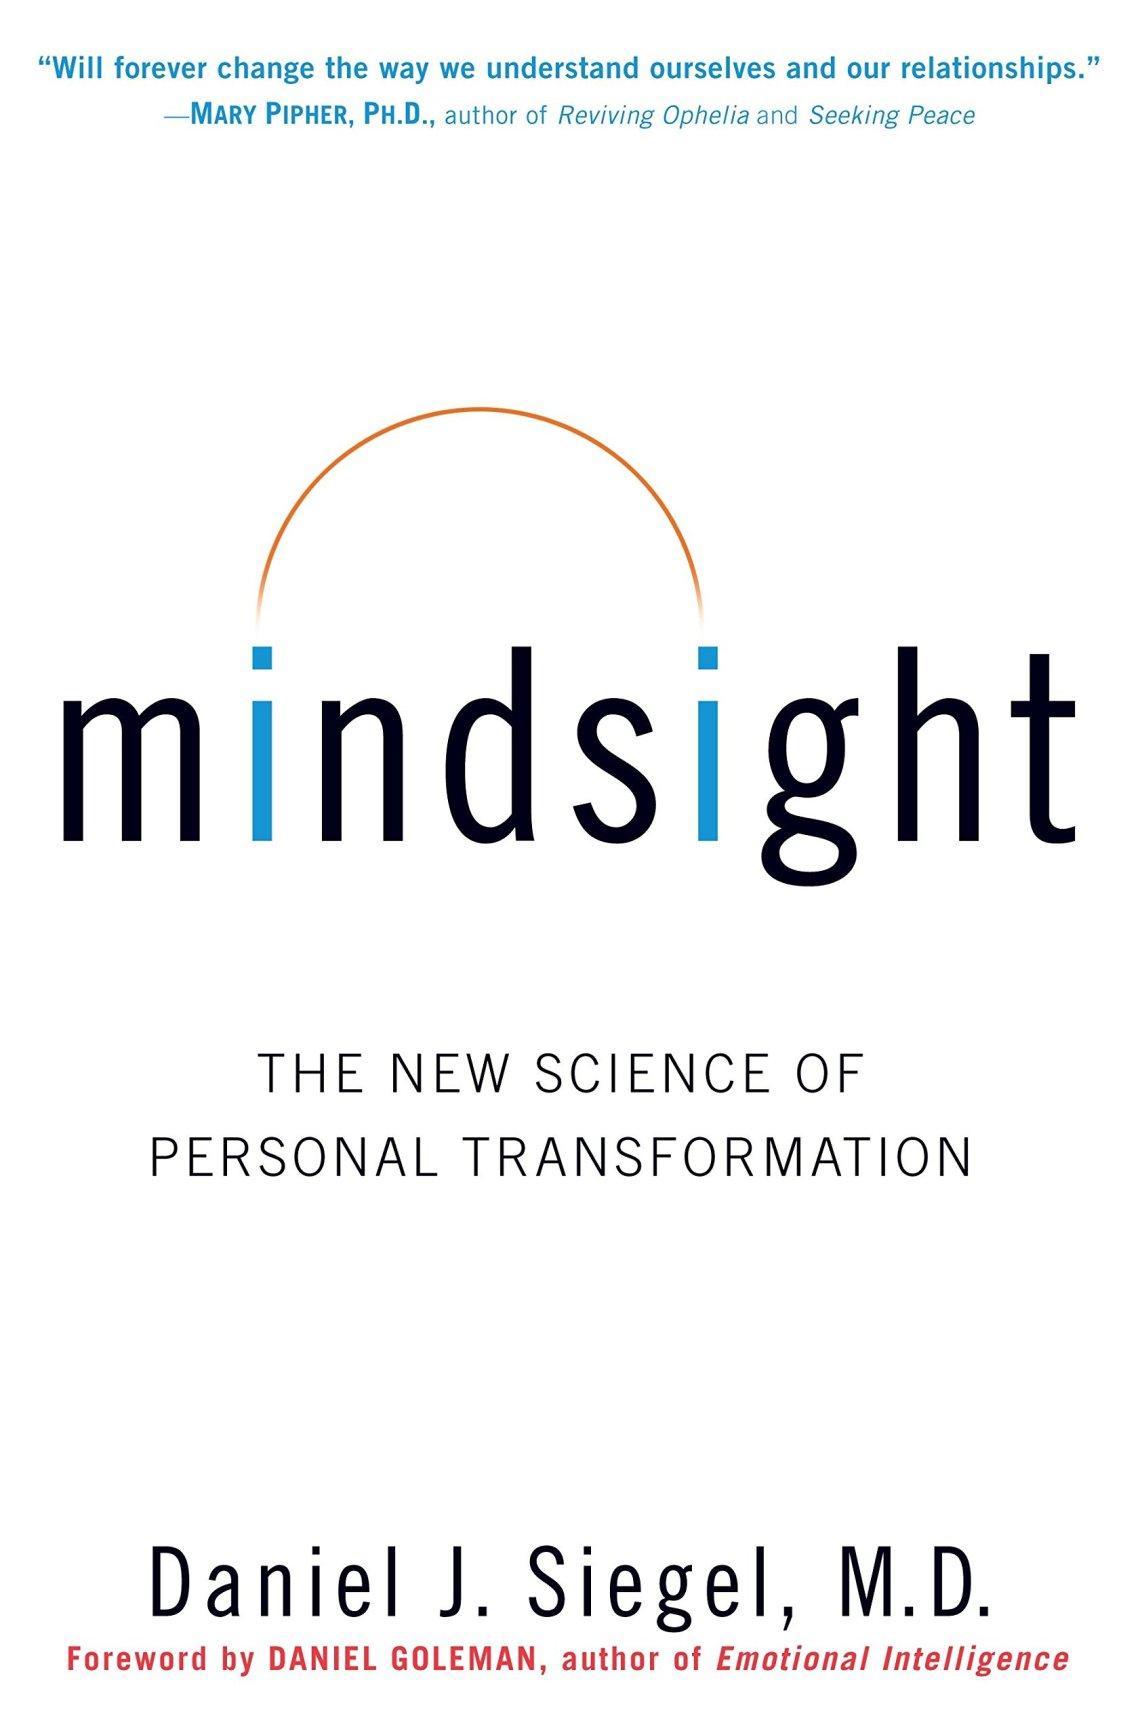 Mindsight: one of self improvement books